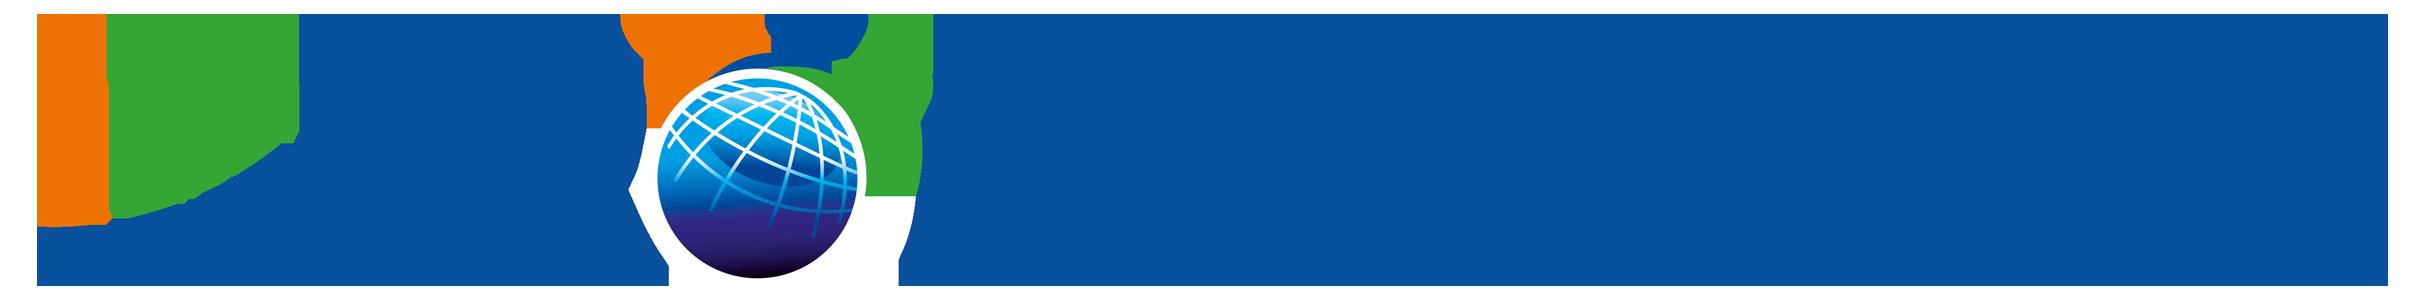 Inpro IT Solutions - Mobile App company logo